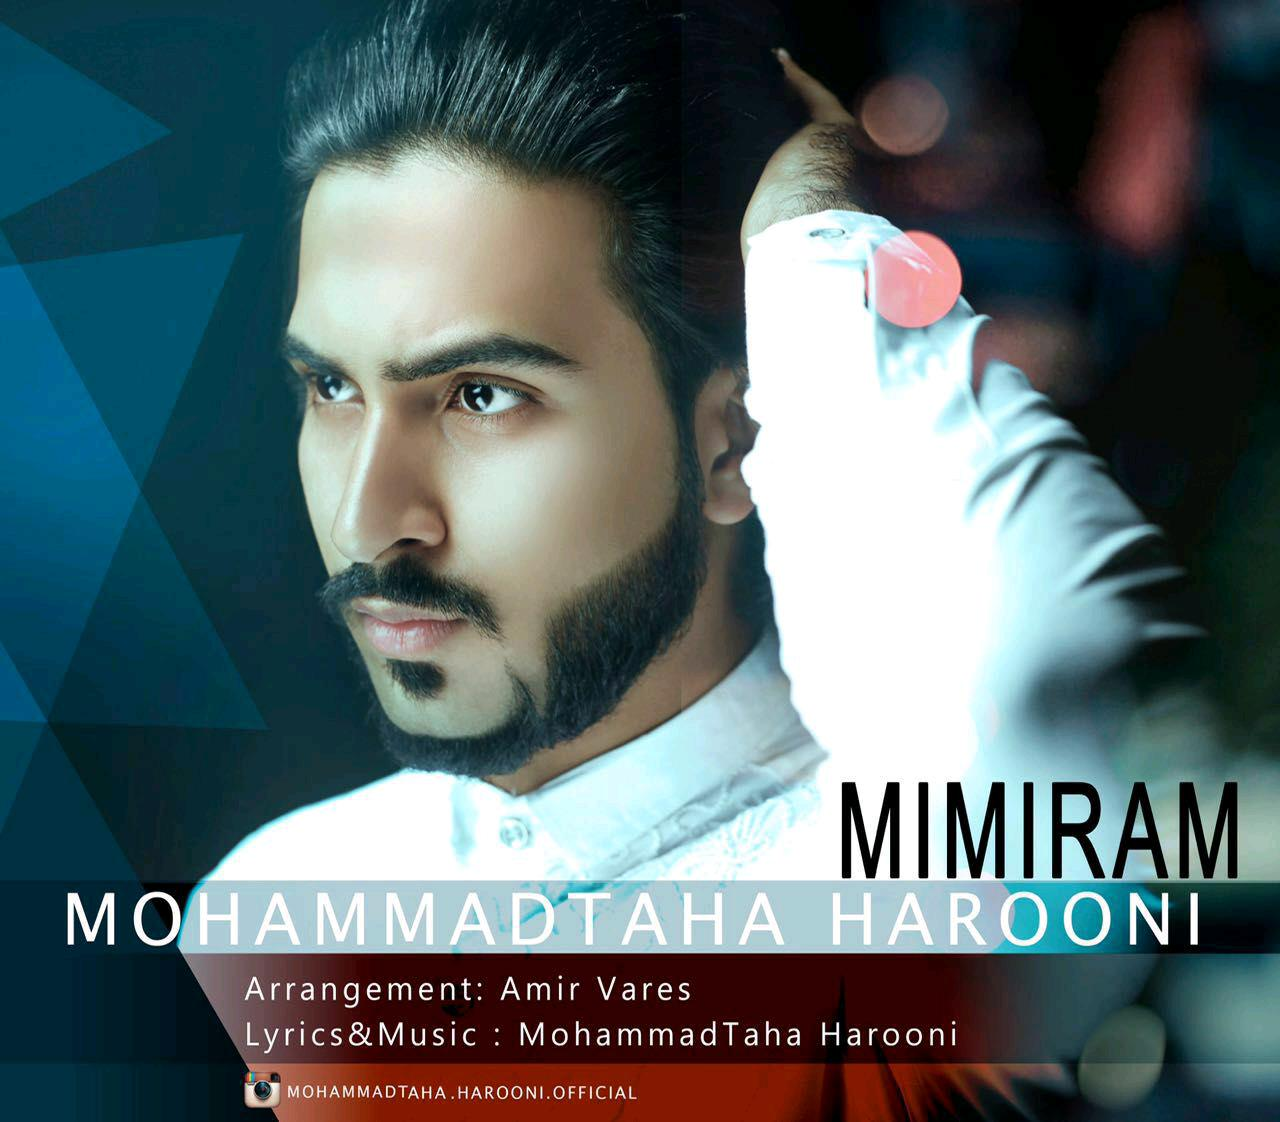 http://dl.rasanejavan.com/RadioJavan%201395/khordad%2095/14/Mohamad%20Taha%20Harooni%20-MiMiram.jpg